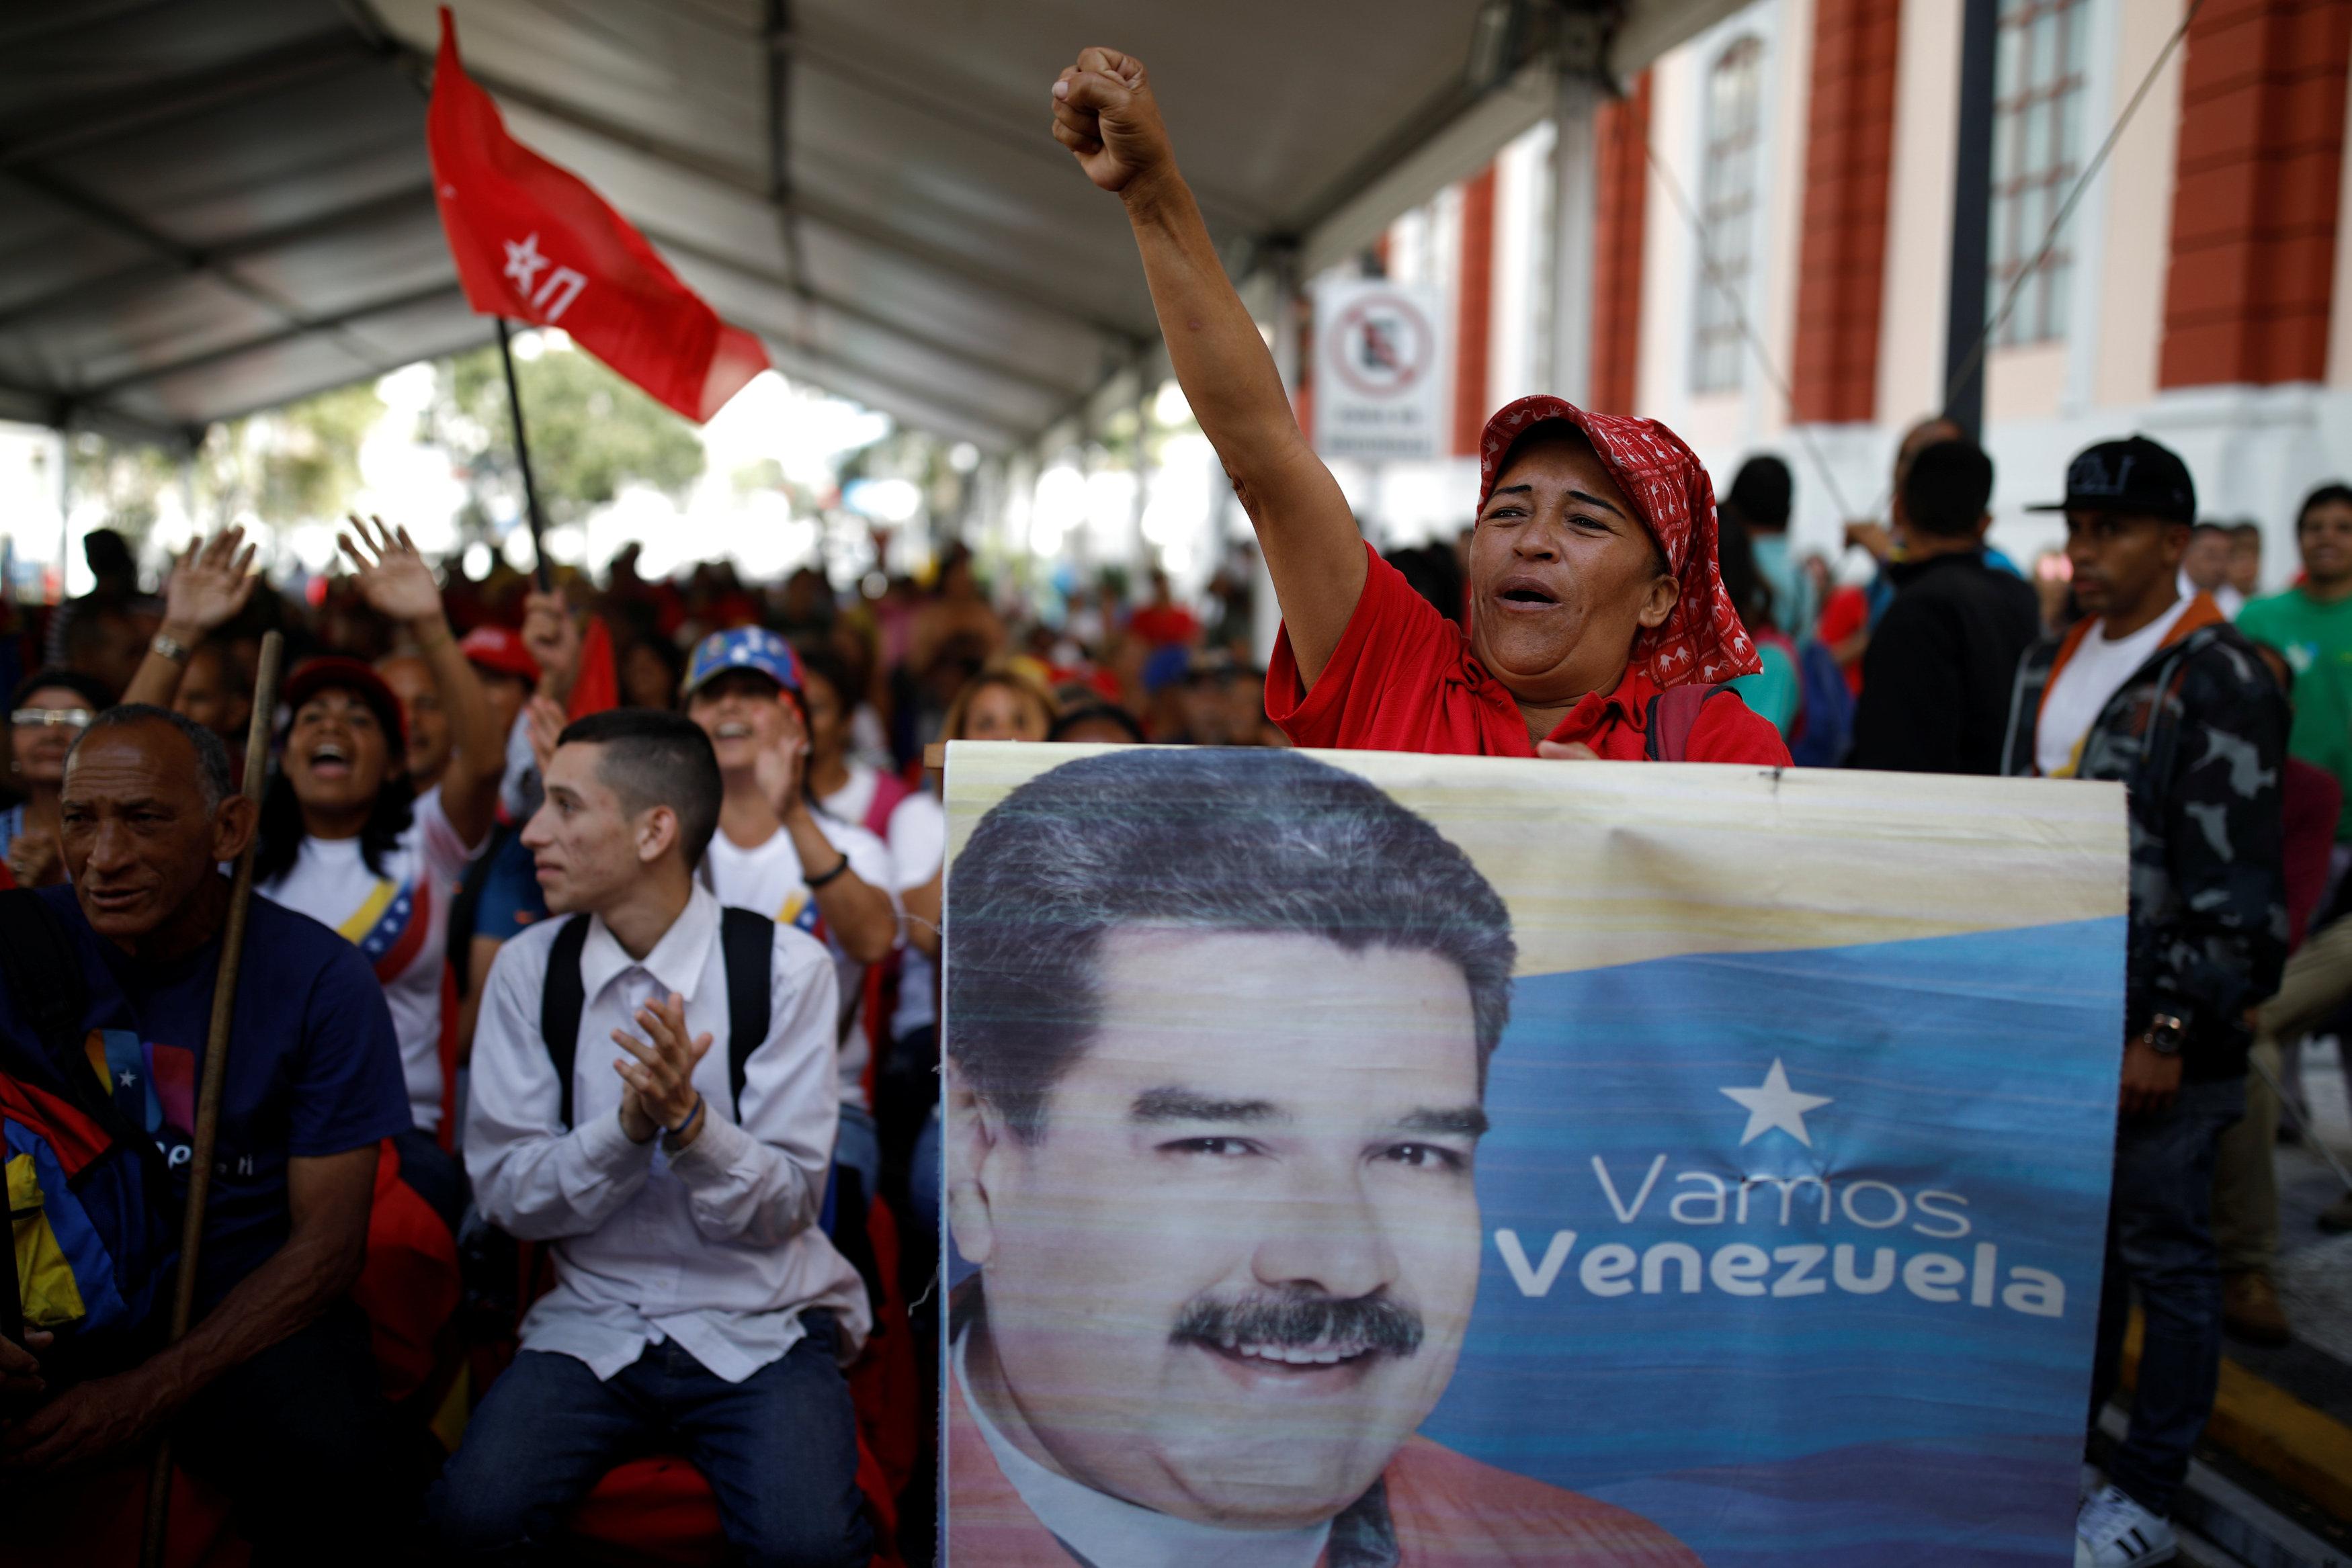 2019-01-26t210357z_1663130408_rc16a07a7130_rtrmadp_3_venezuela-politics